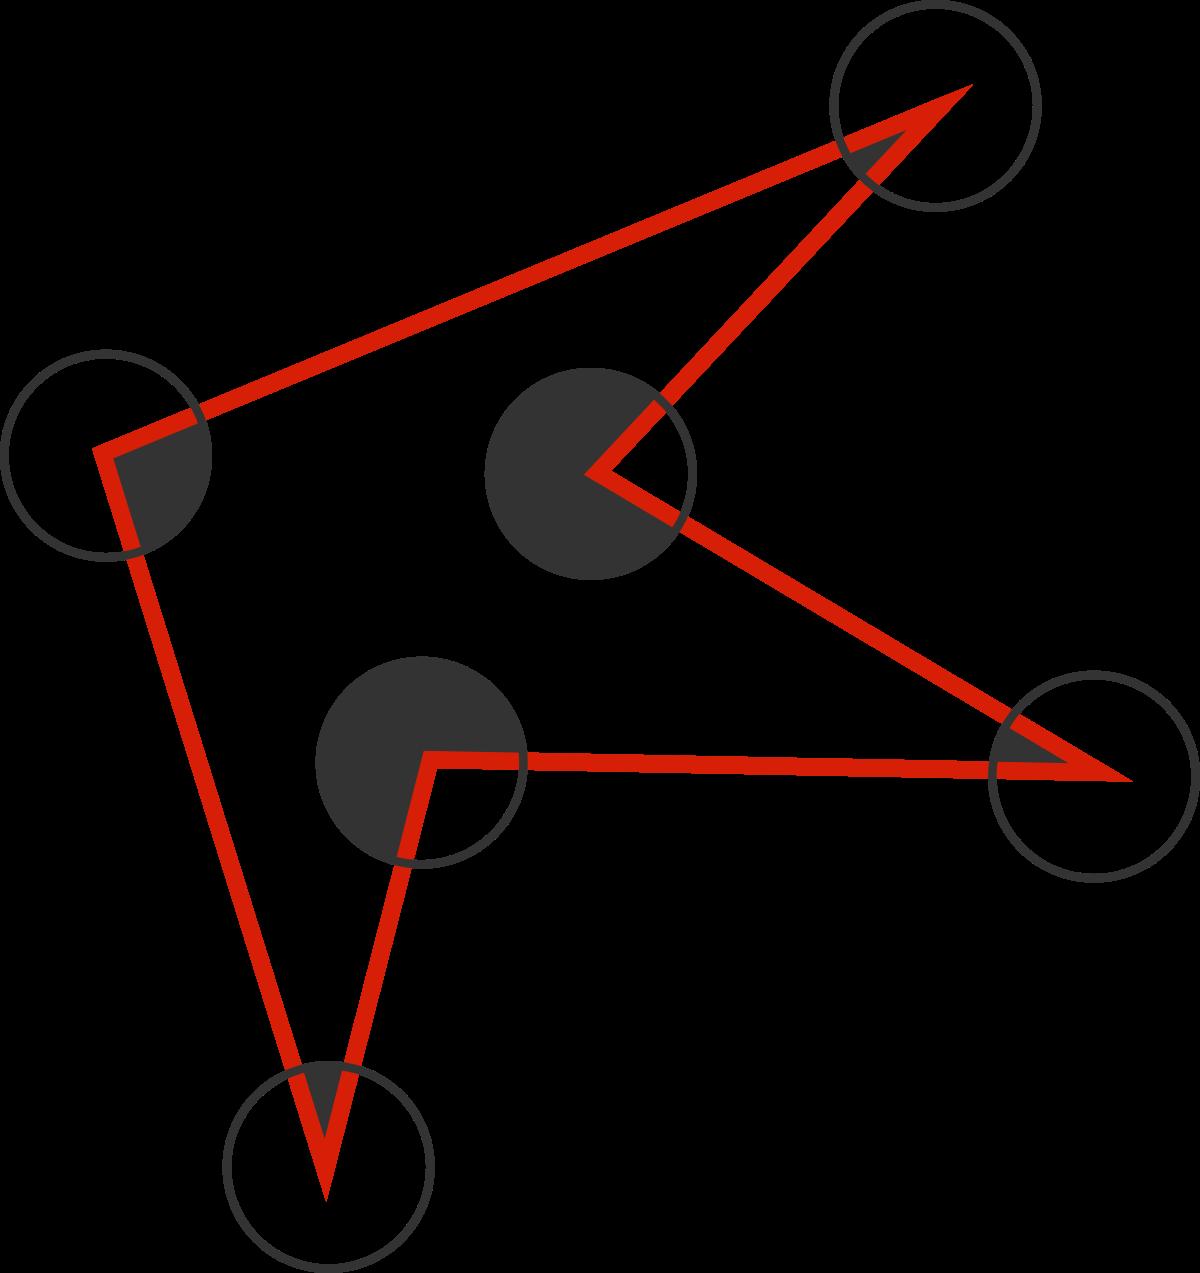 Polygons brilliant math science. Hexagon clipart irregular